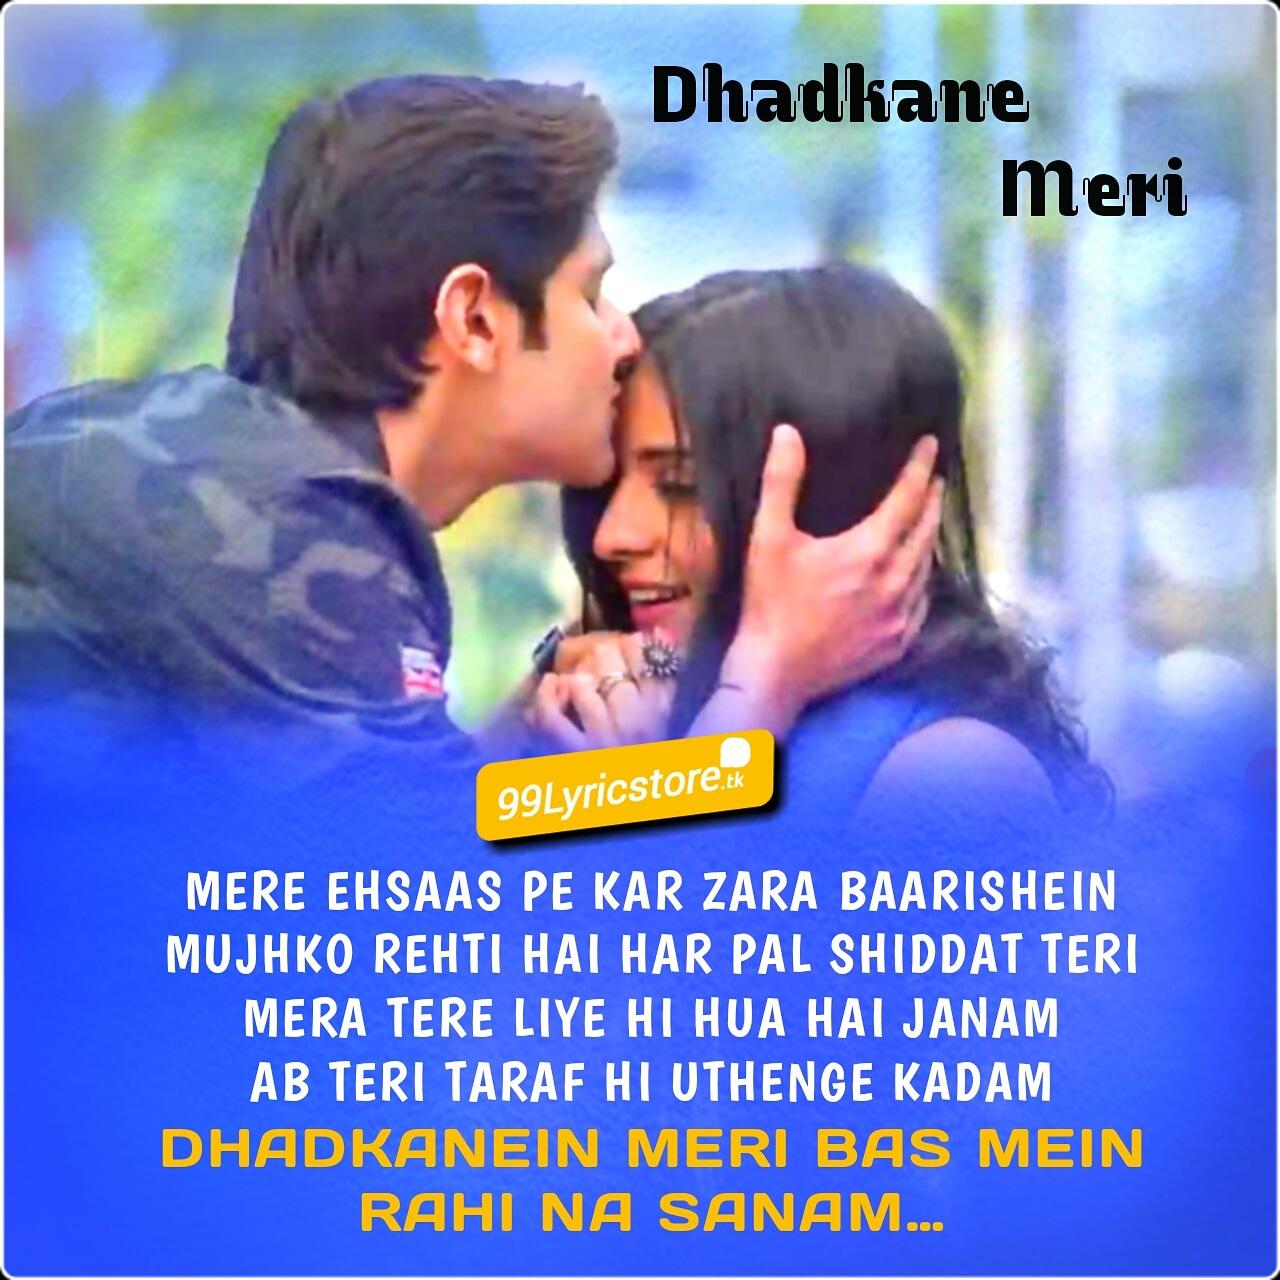 Dhadkane Meri Lyrics Yasser Desai Asees Kaur